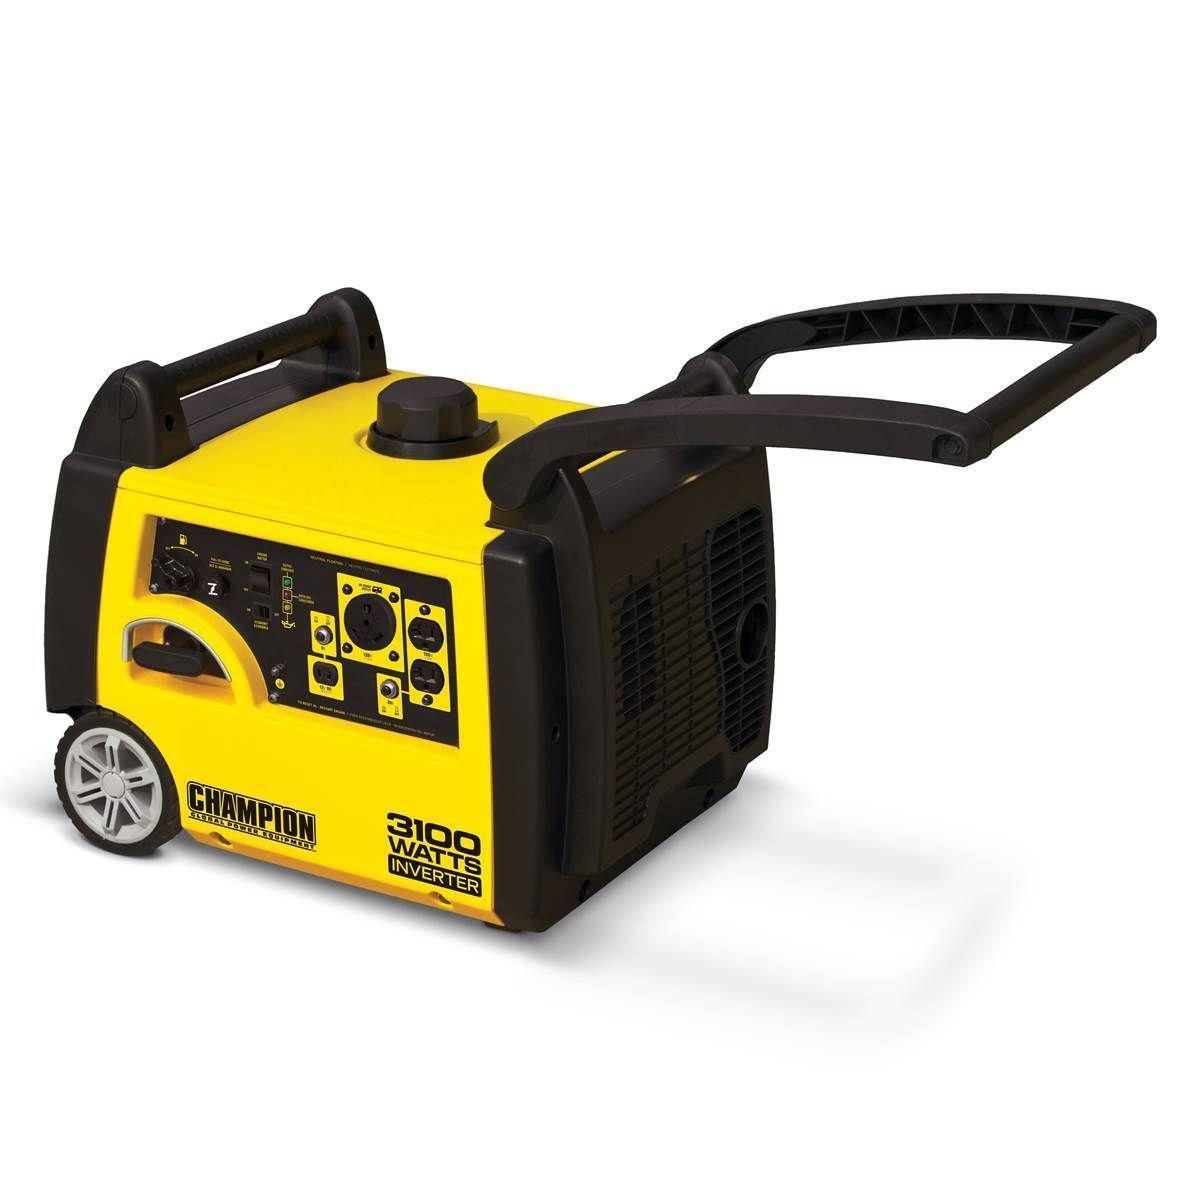 portable inverter generator 3100 watt 4 cycle 24 hp 171cc champion engine rv em ebay